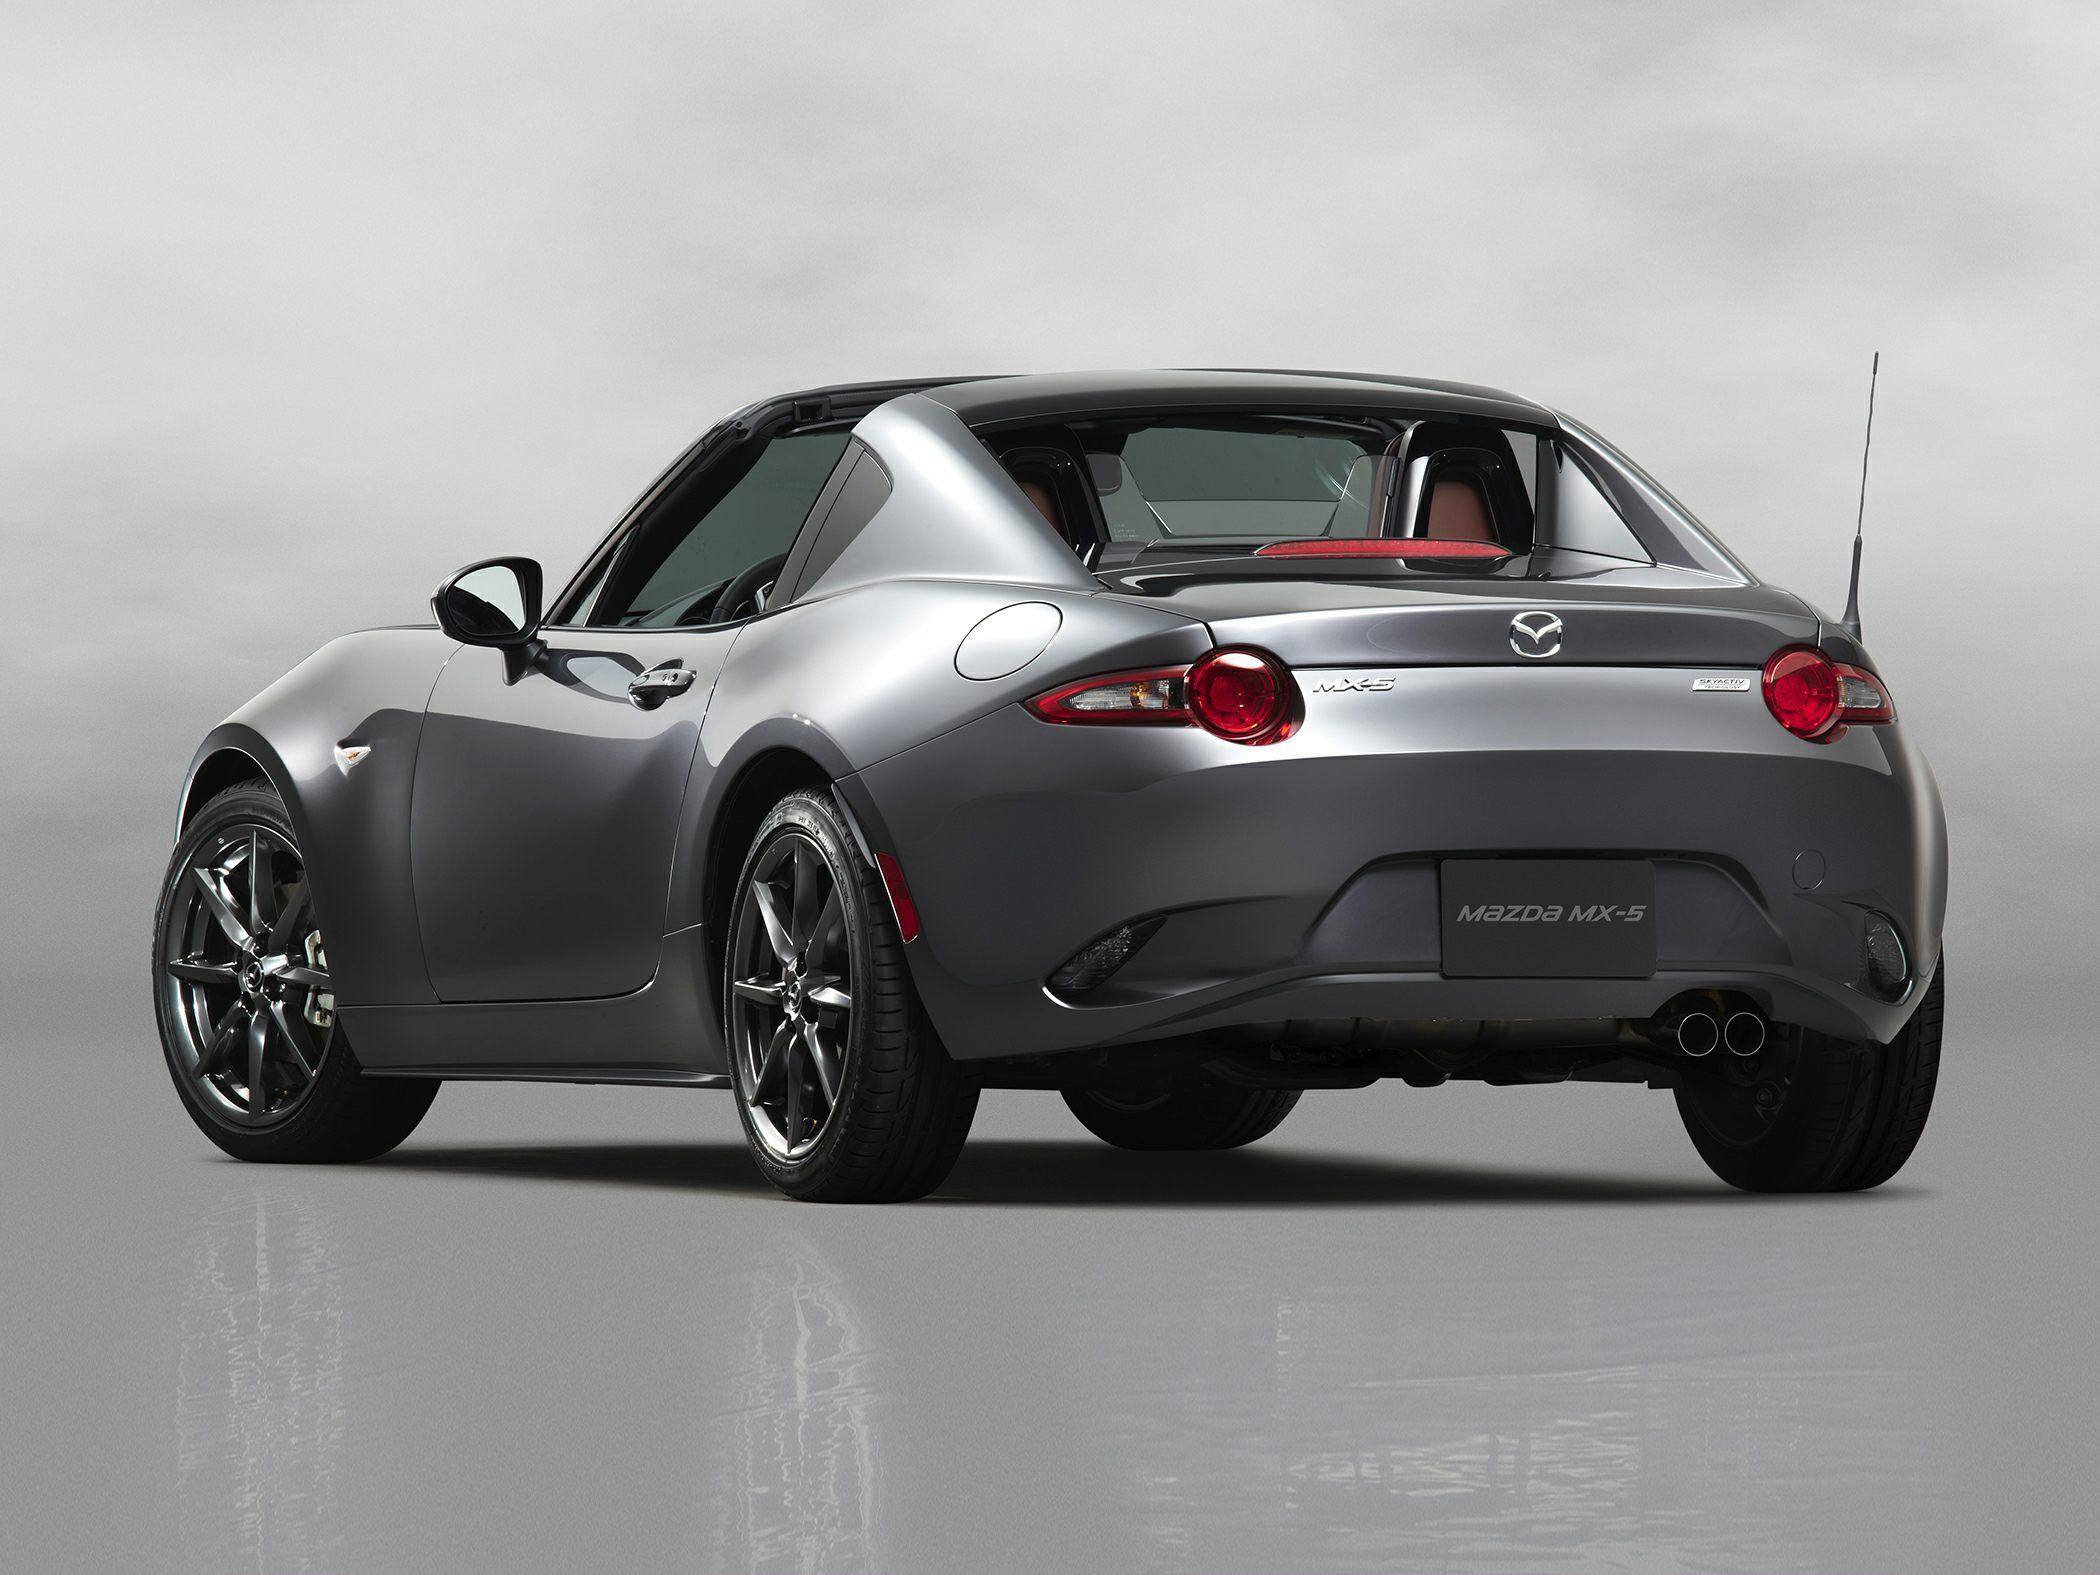 Mazda Mx 5 Rf Cena >> 2018 Mazda Mx 5 Miata Deals Prices Incentives Leases Overview